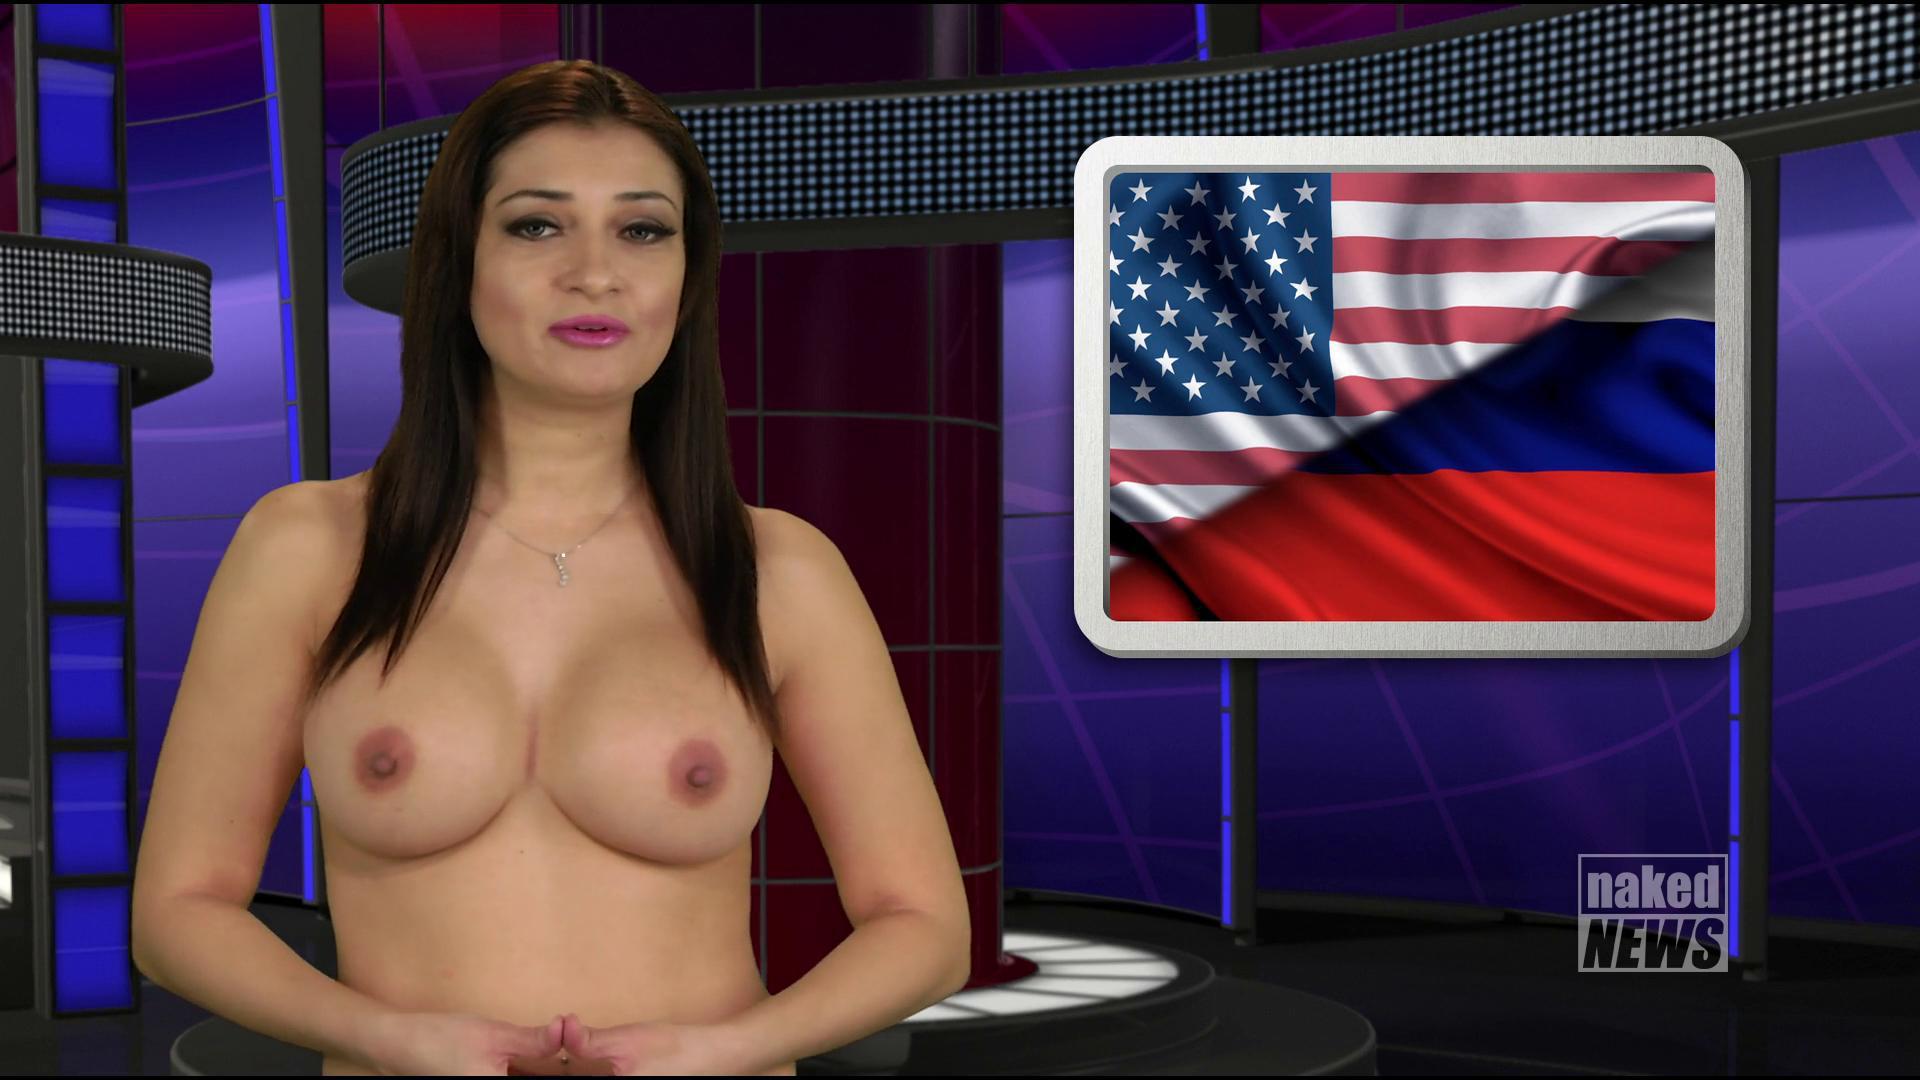 Hot naked news babes — photo 14